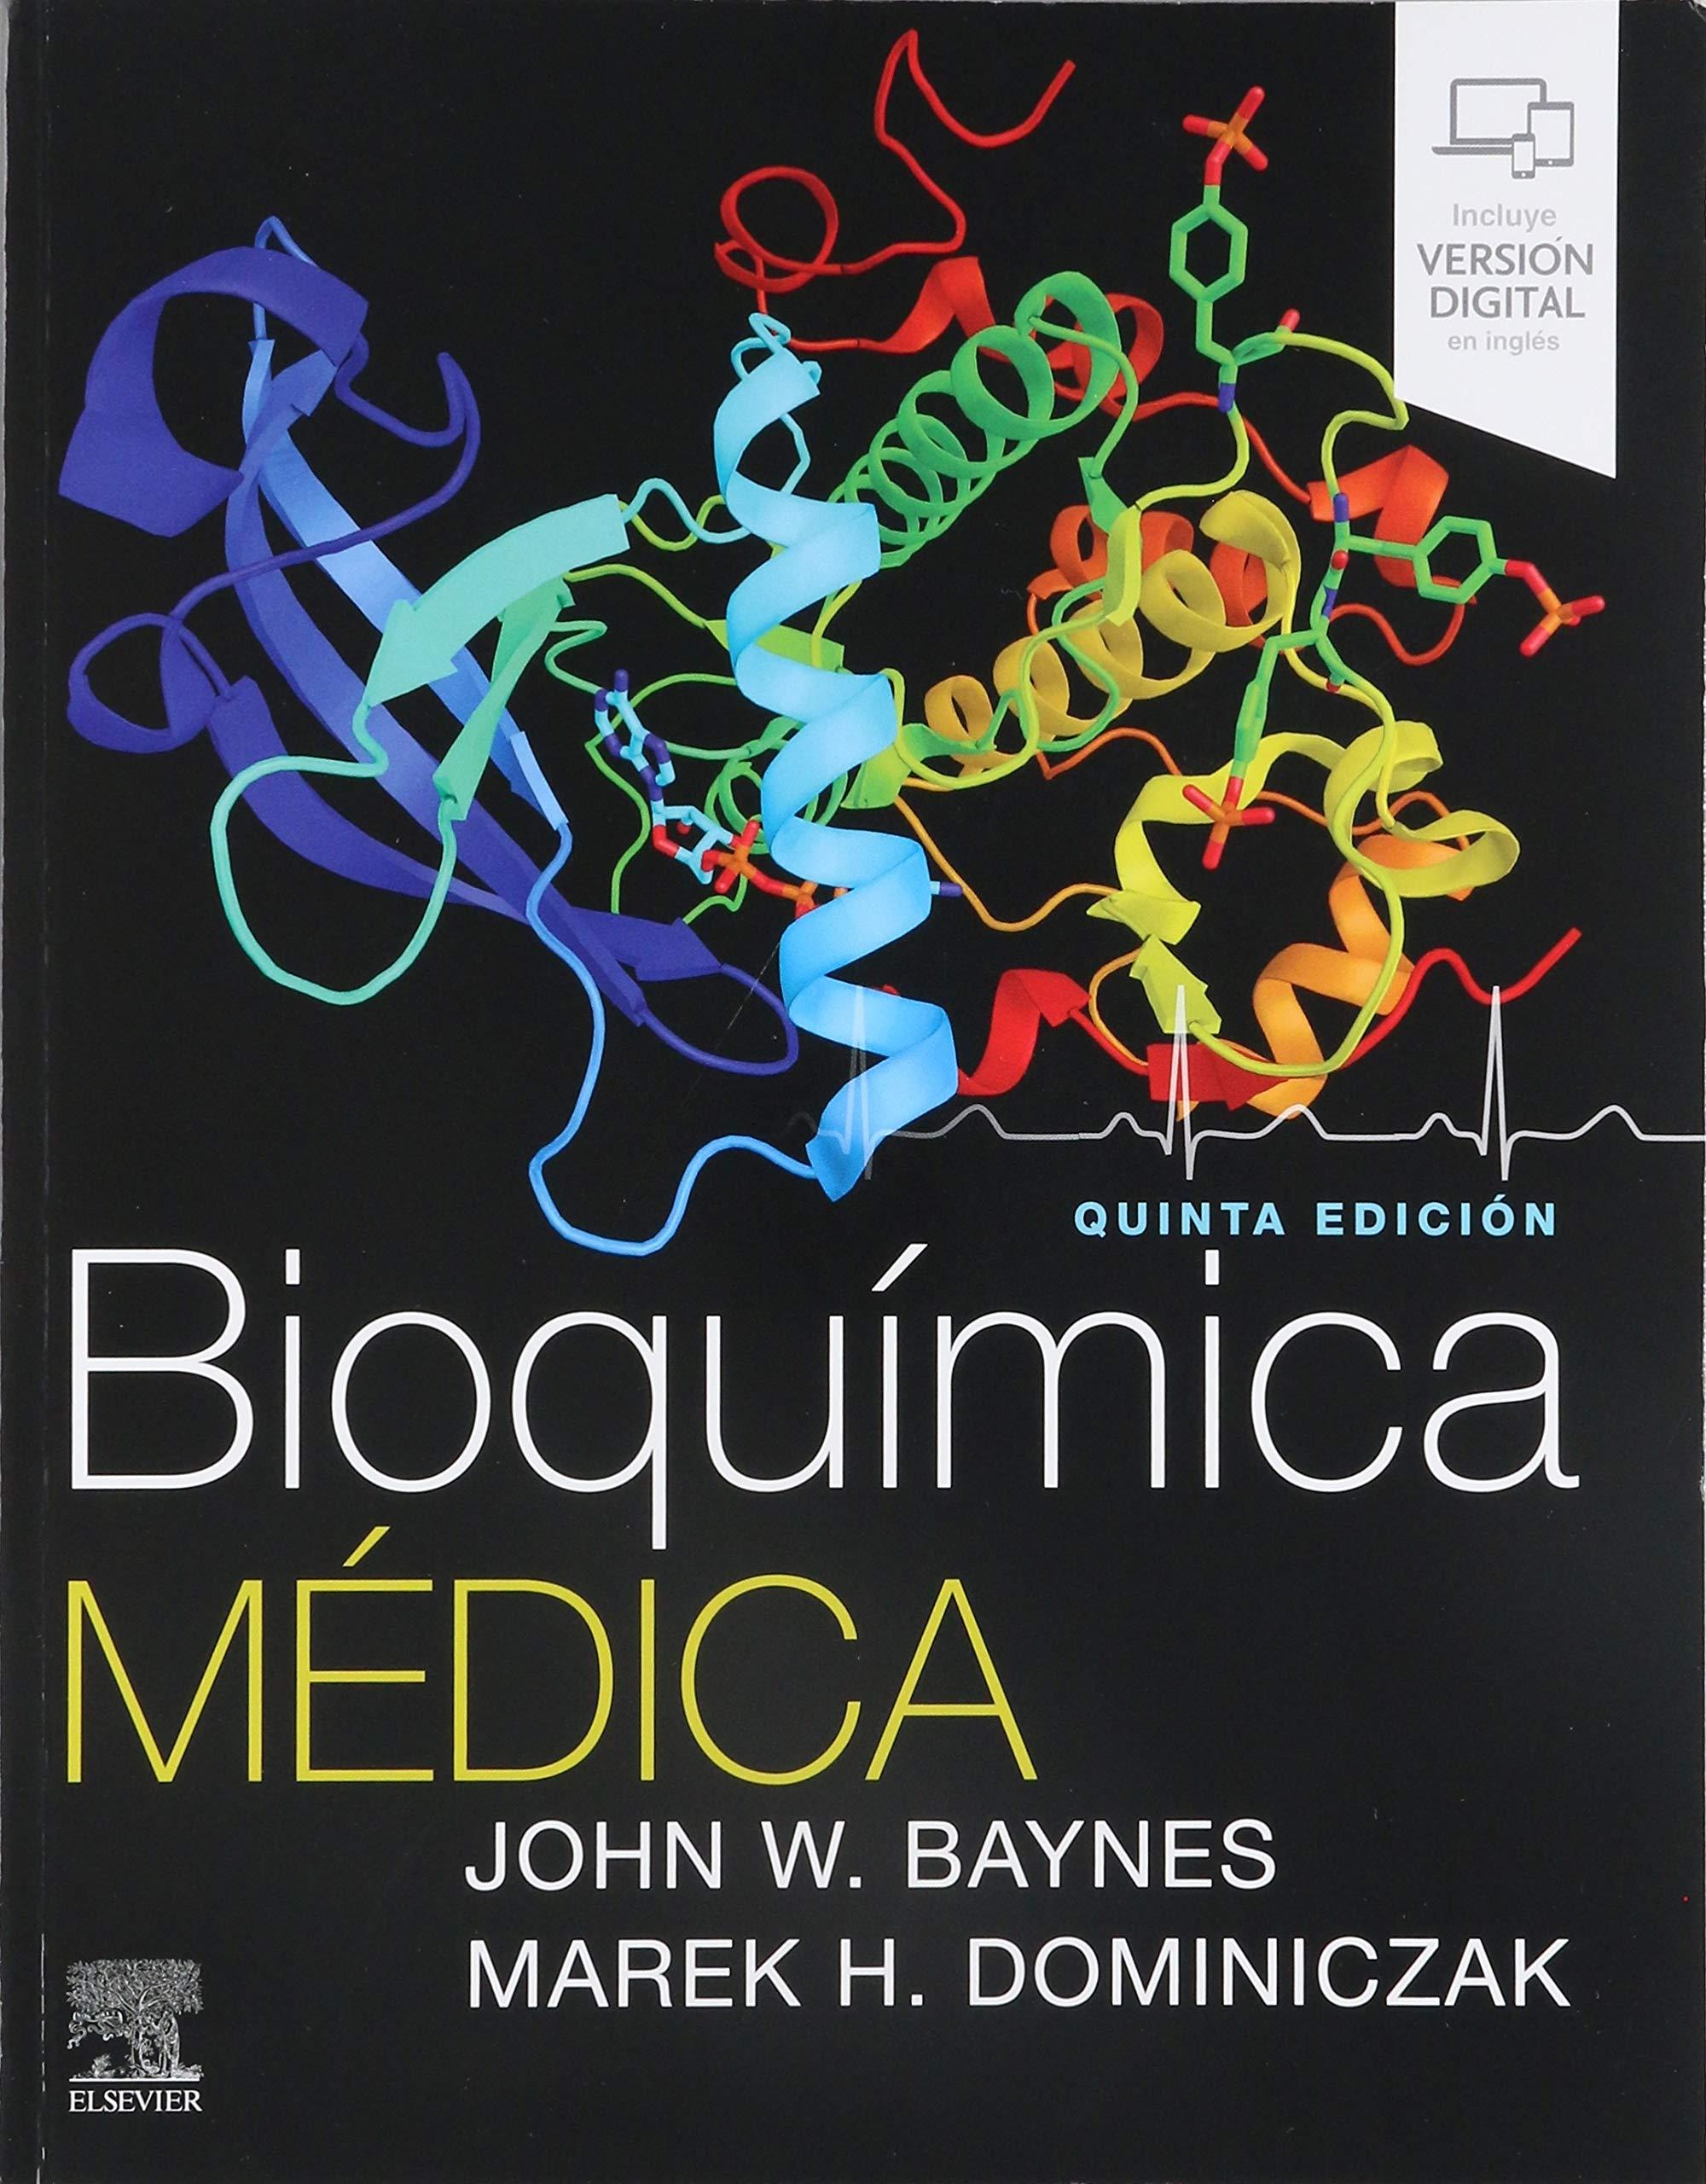 Baynes. Bioquímica médica. 5ª ed. 2019